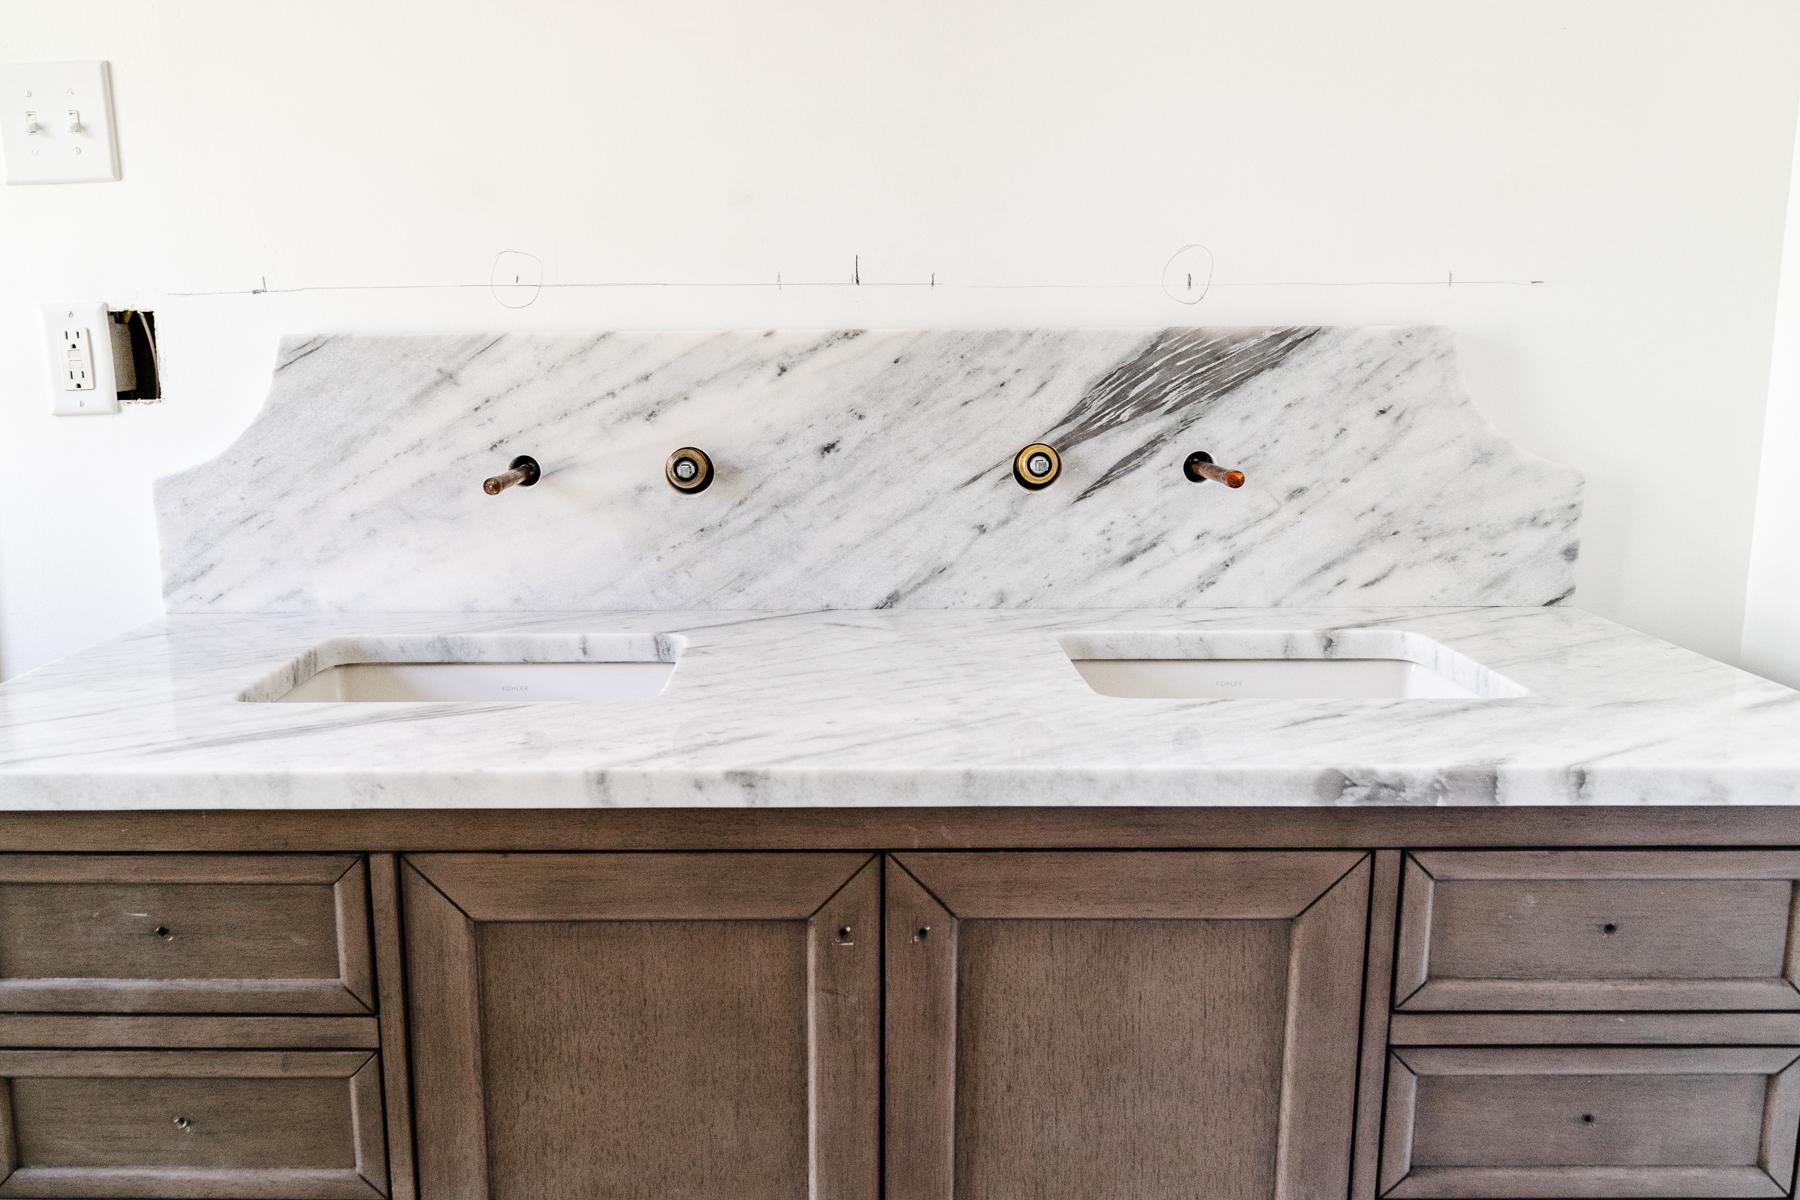 marble countertop and scalloped backsplash